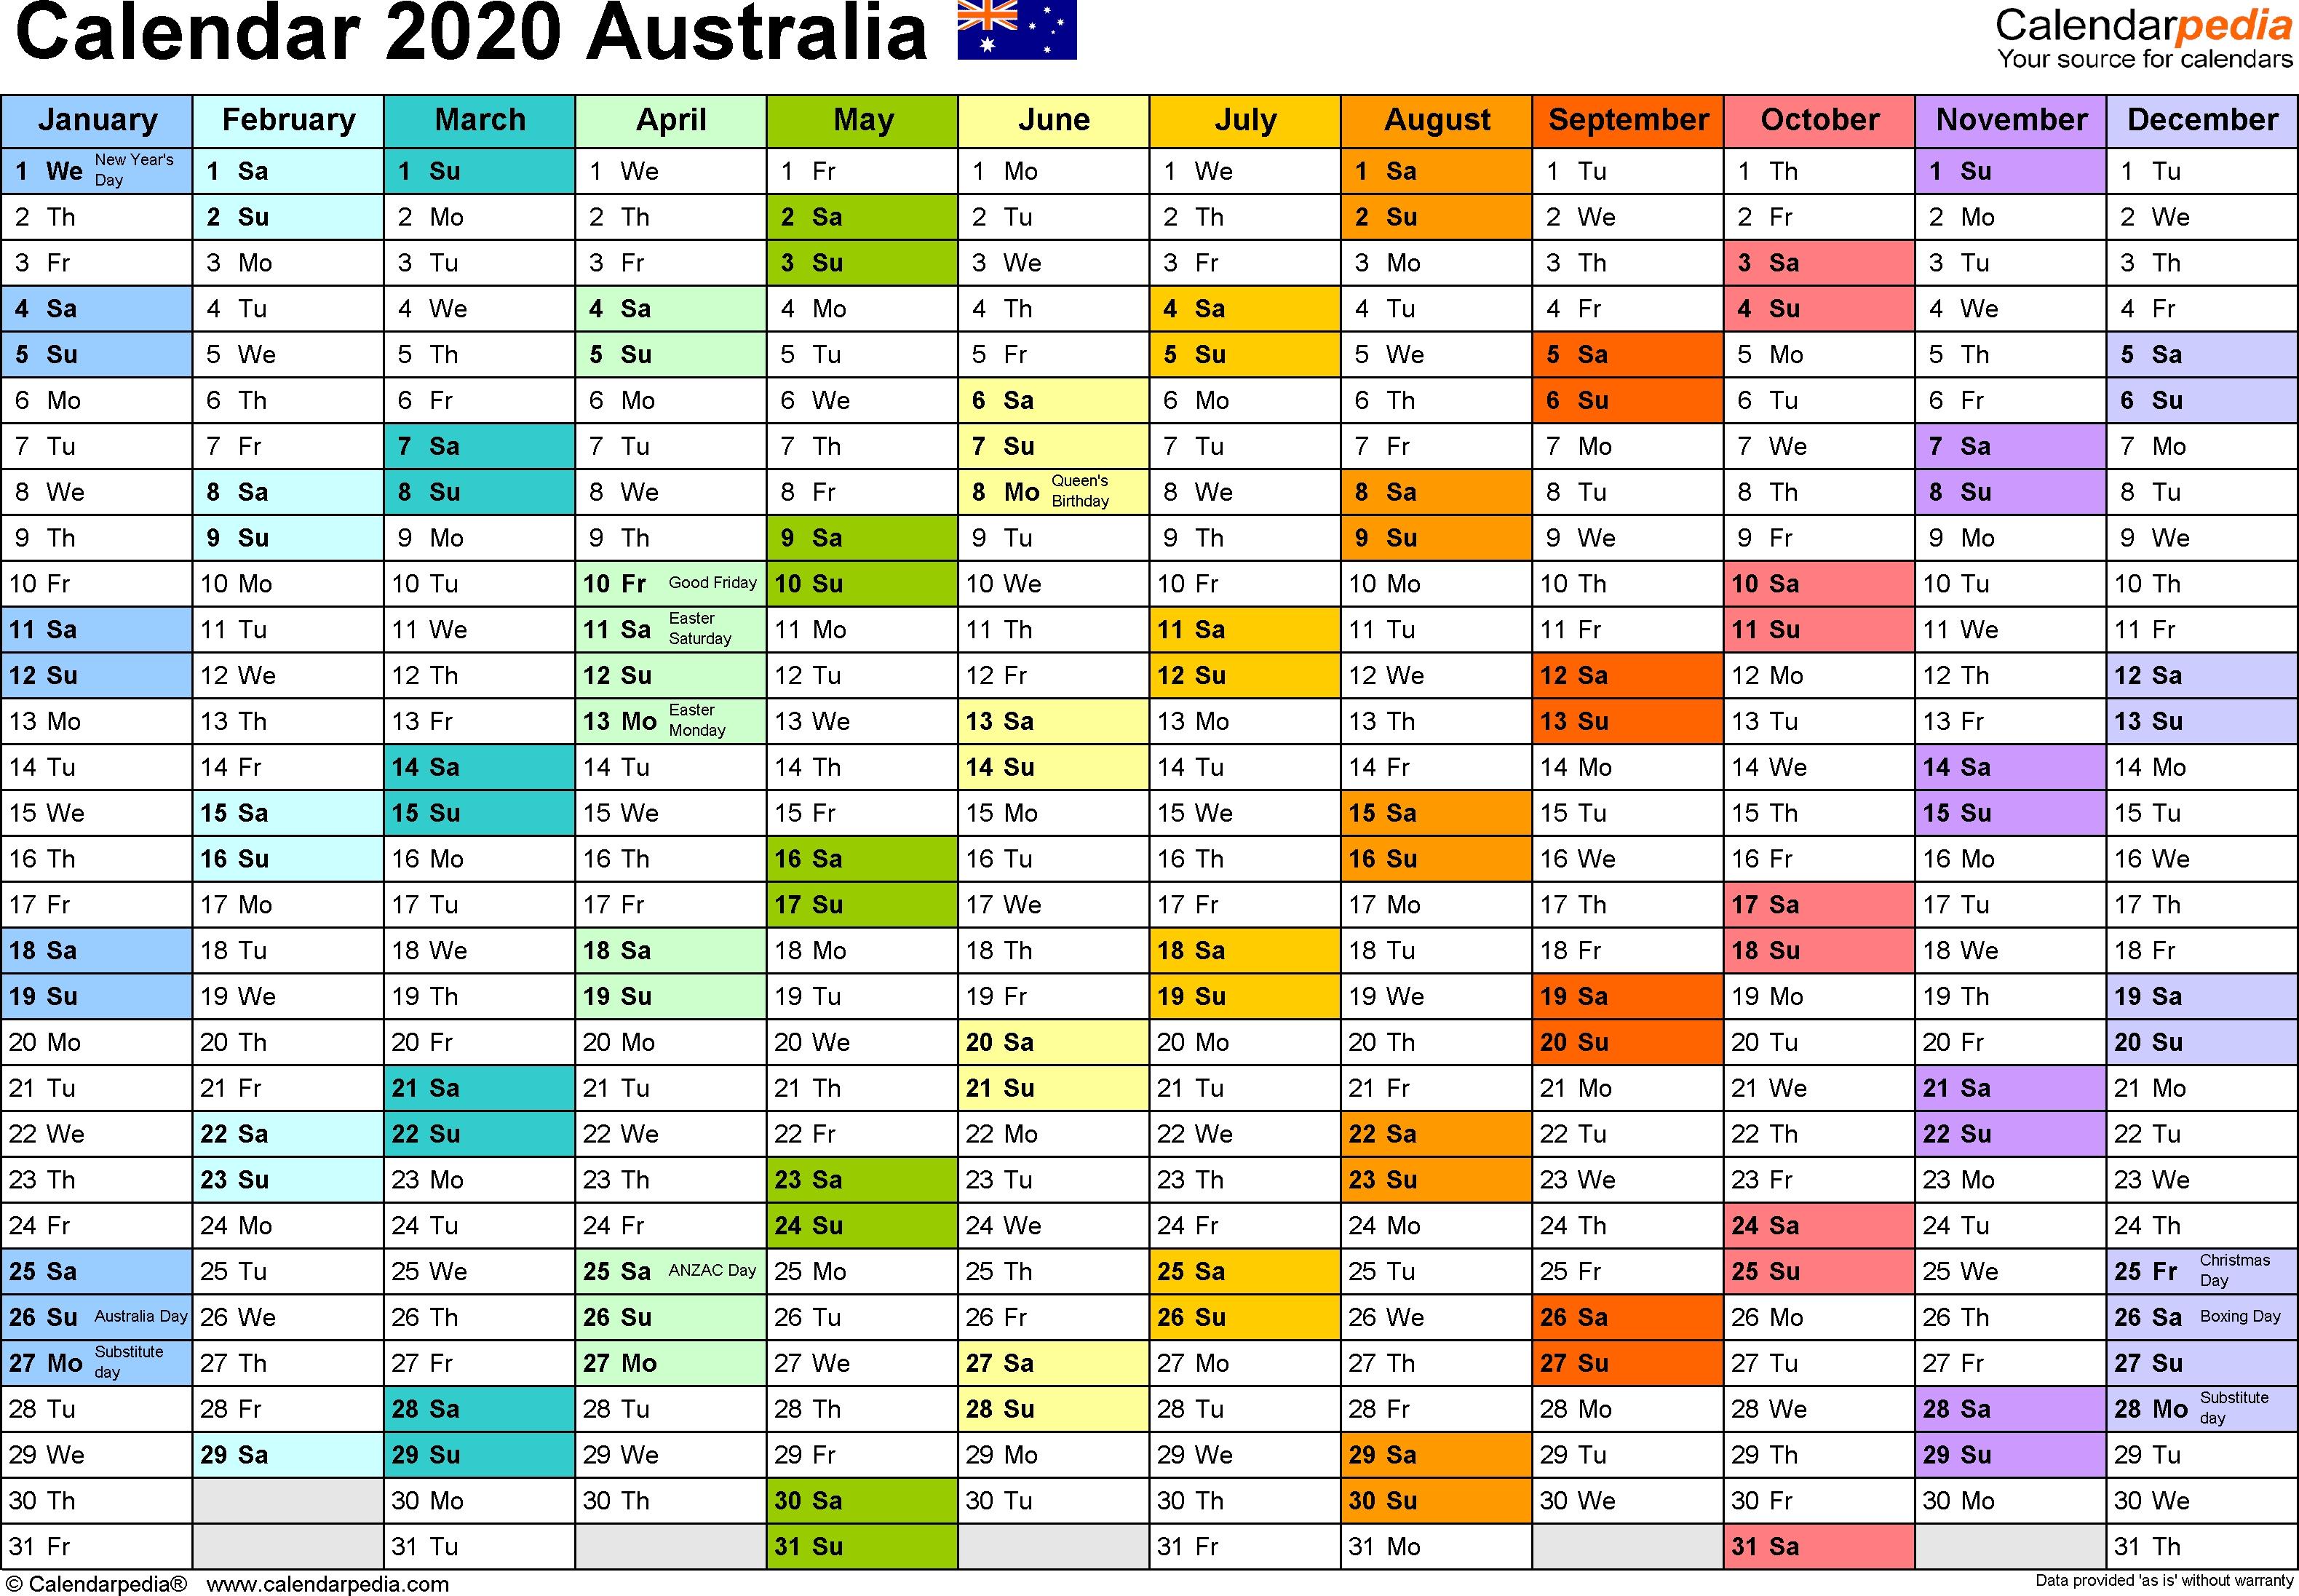 Australia Calendar 2020 - Free Printable Pdf Templates Printable Monthly Calendar 2020 Australia With School Holidays